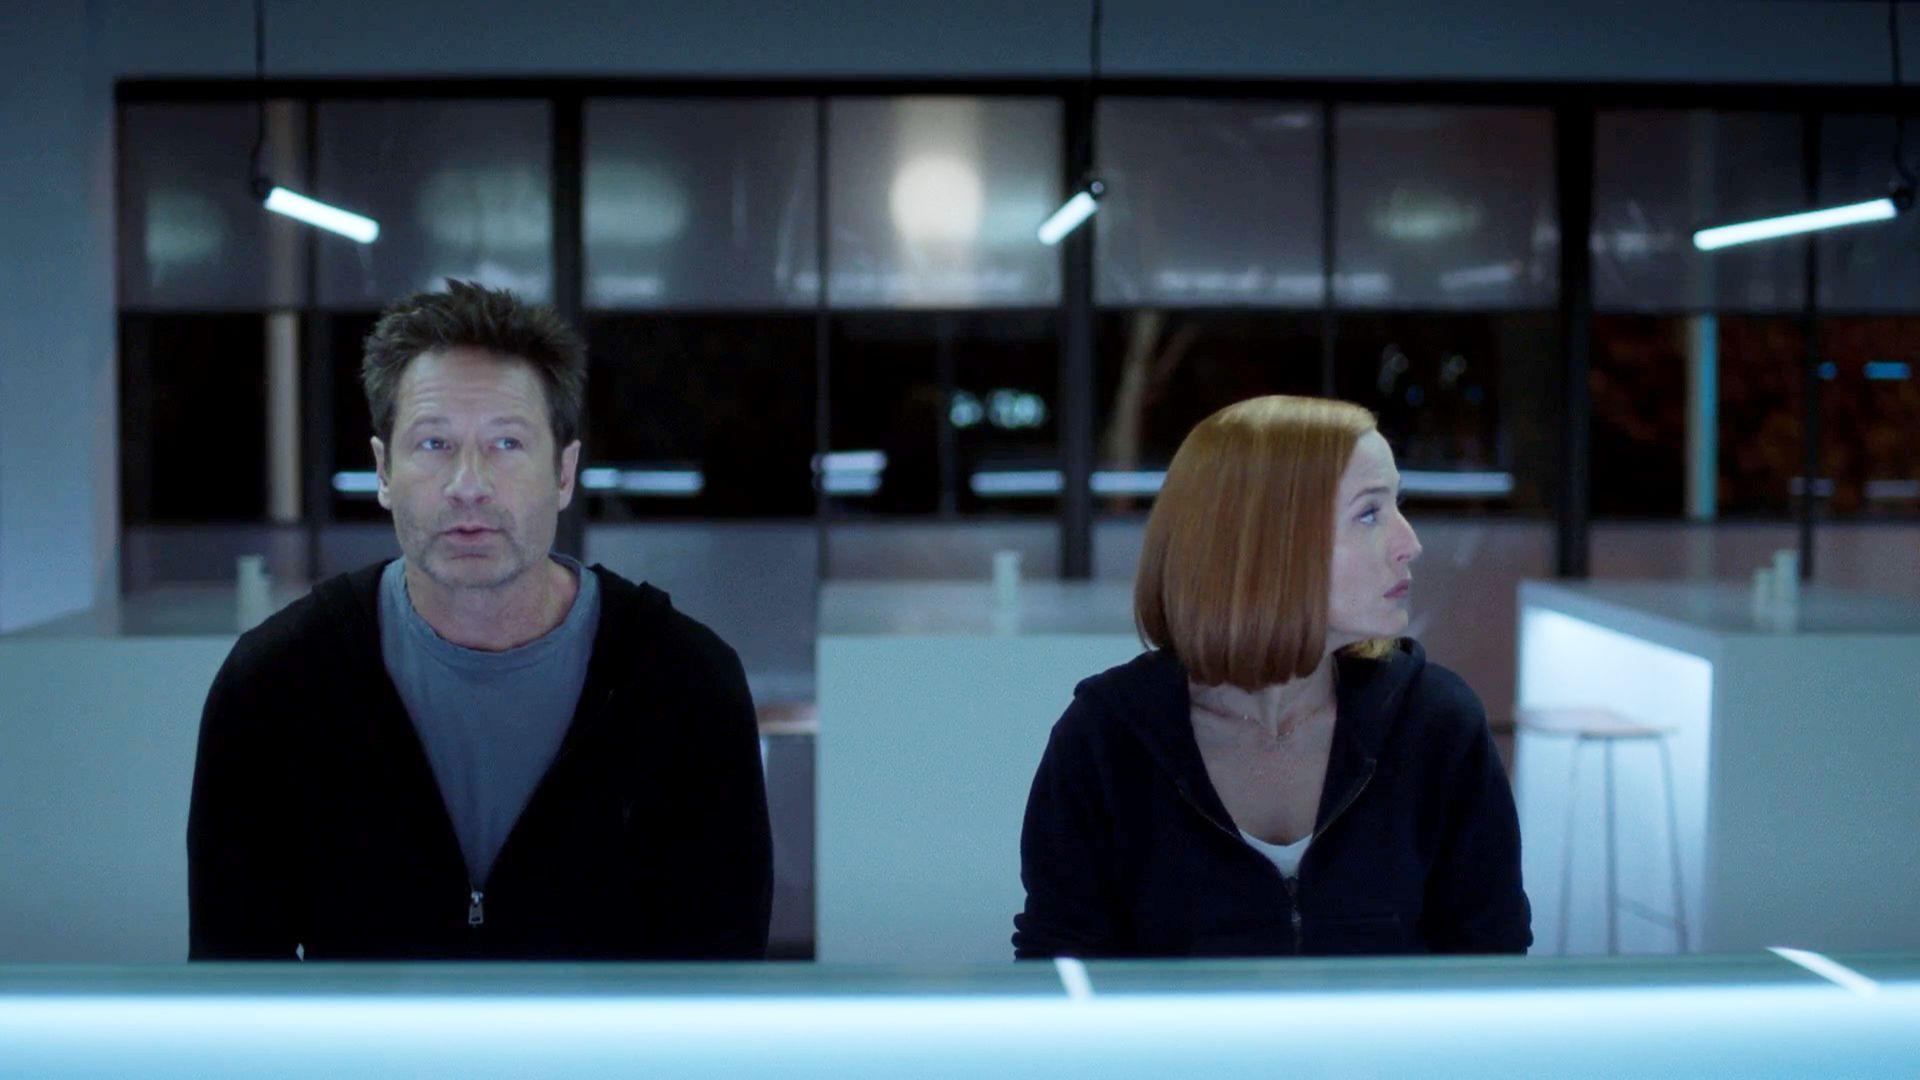 The X-Files — s11e07 — Rm9sbG93ZXJz